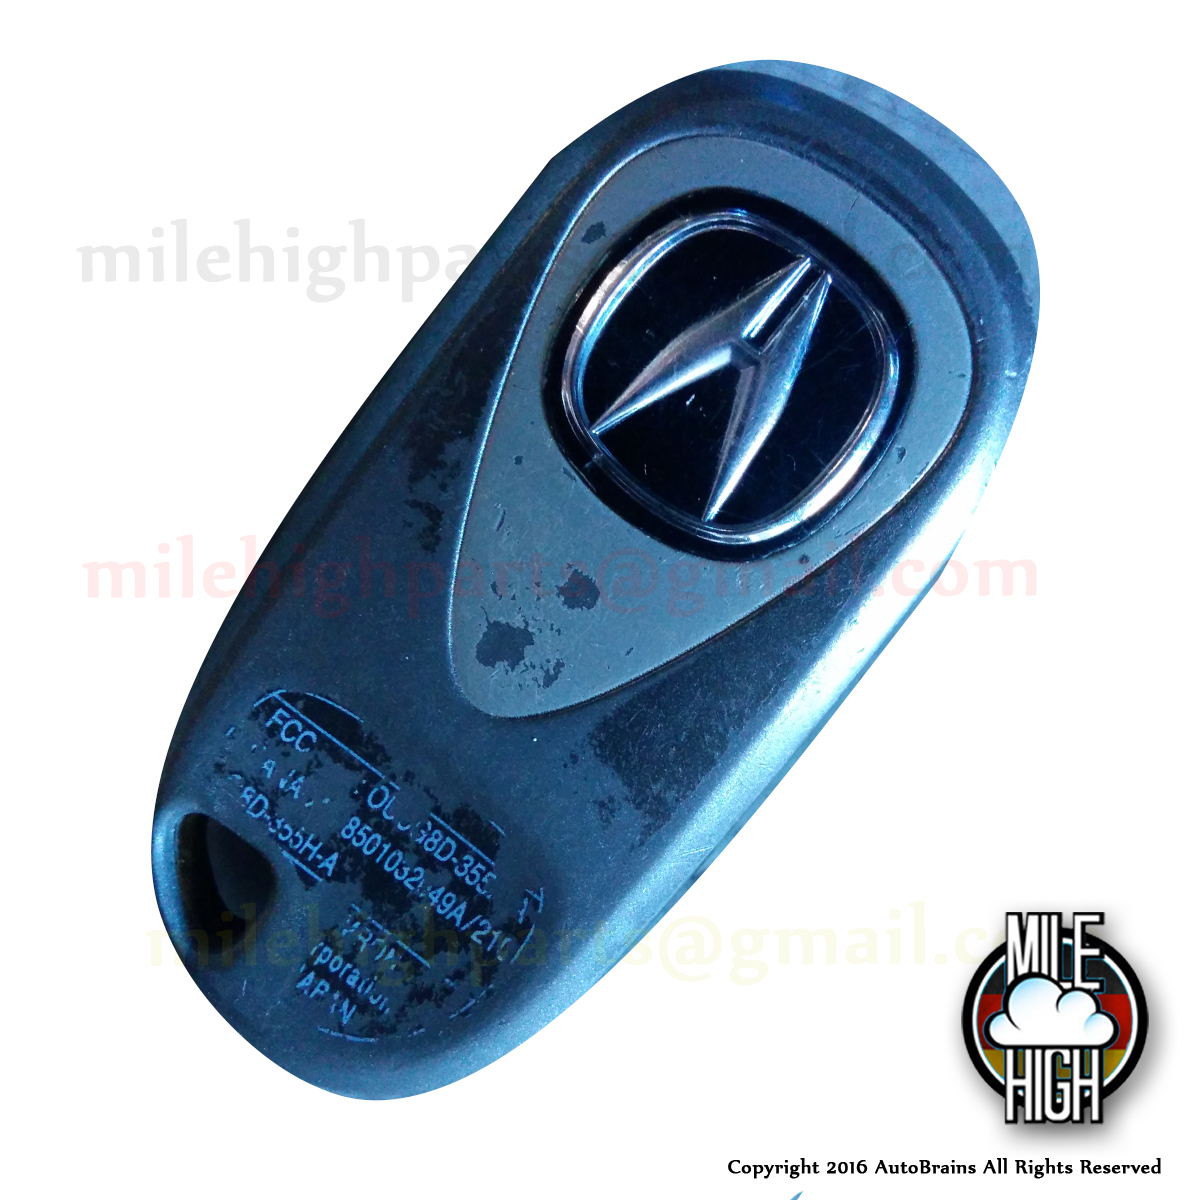 02-06 Acura RSX Remote Key Fob OEM Used